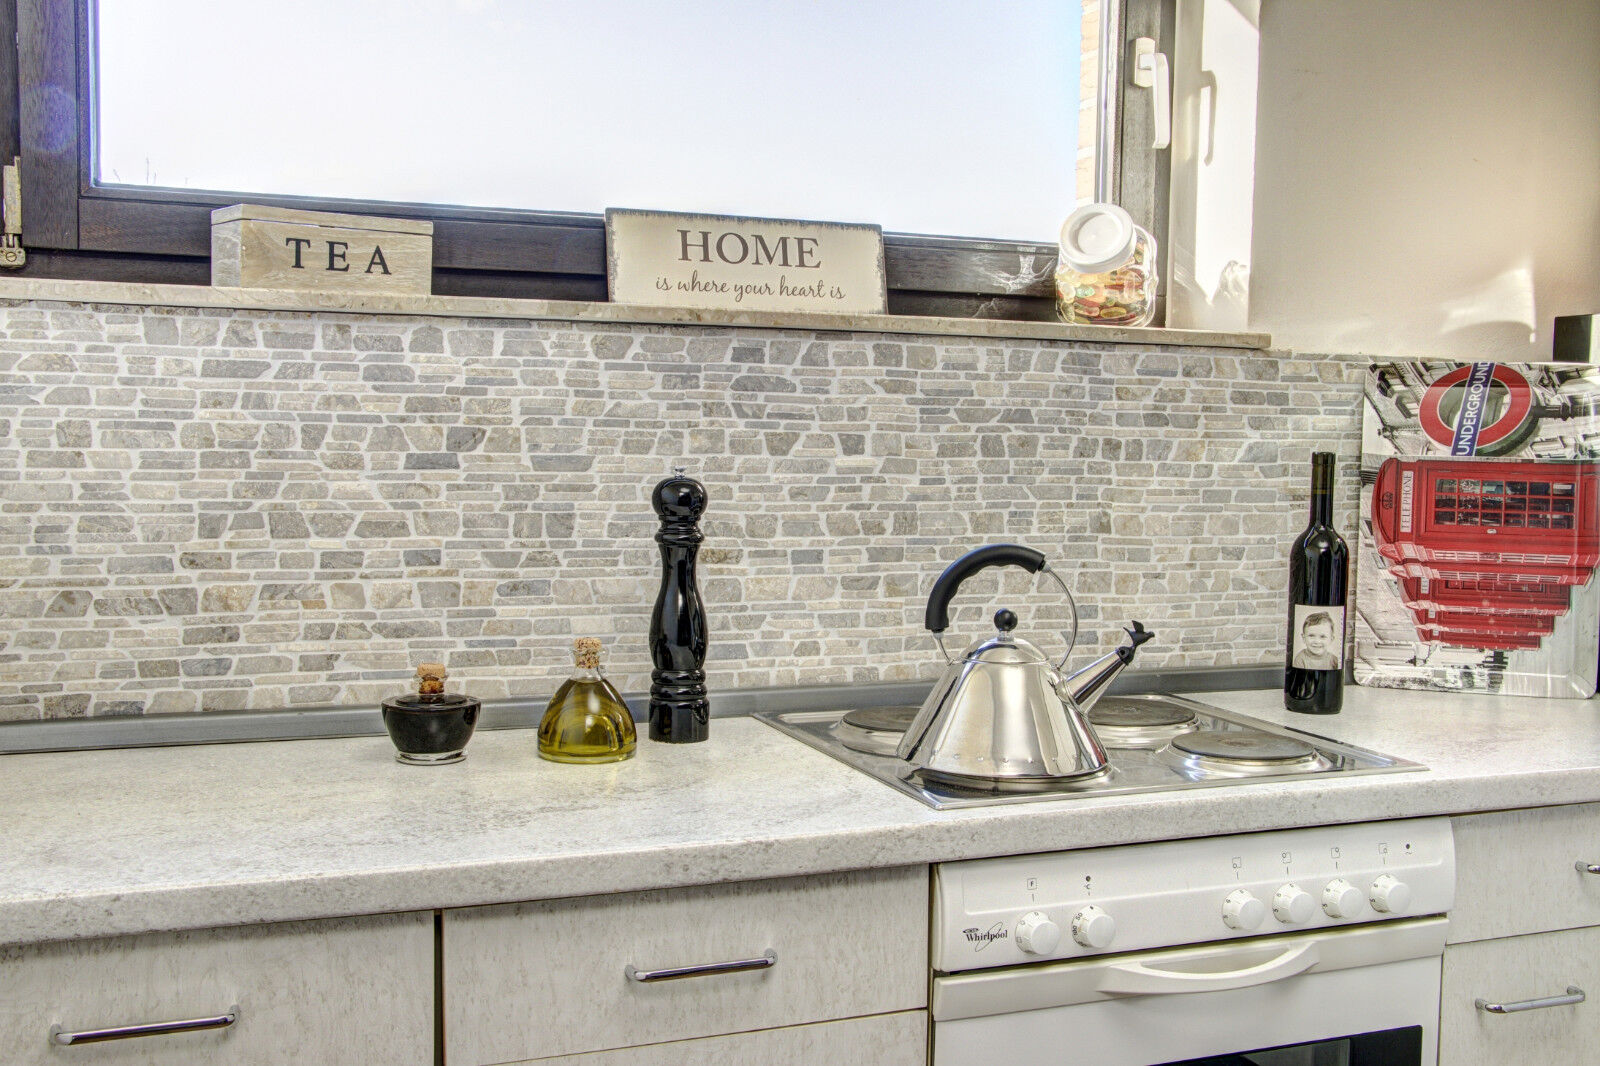 wandfliesen k che test vergleich wandfliesen k che. Black Bedroom Furniture Sets. Home Design Ideas